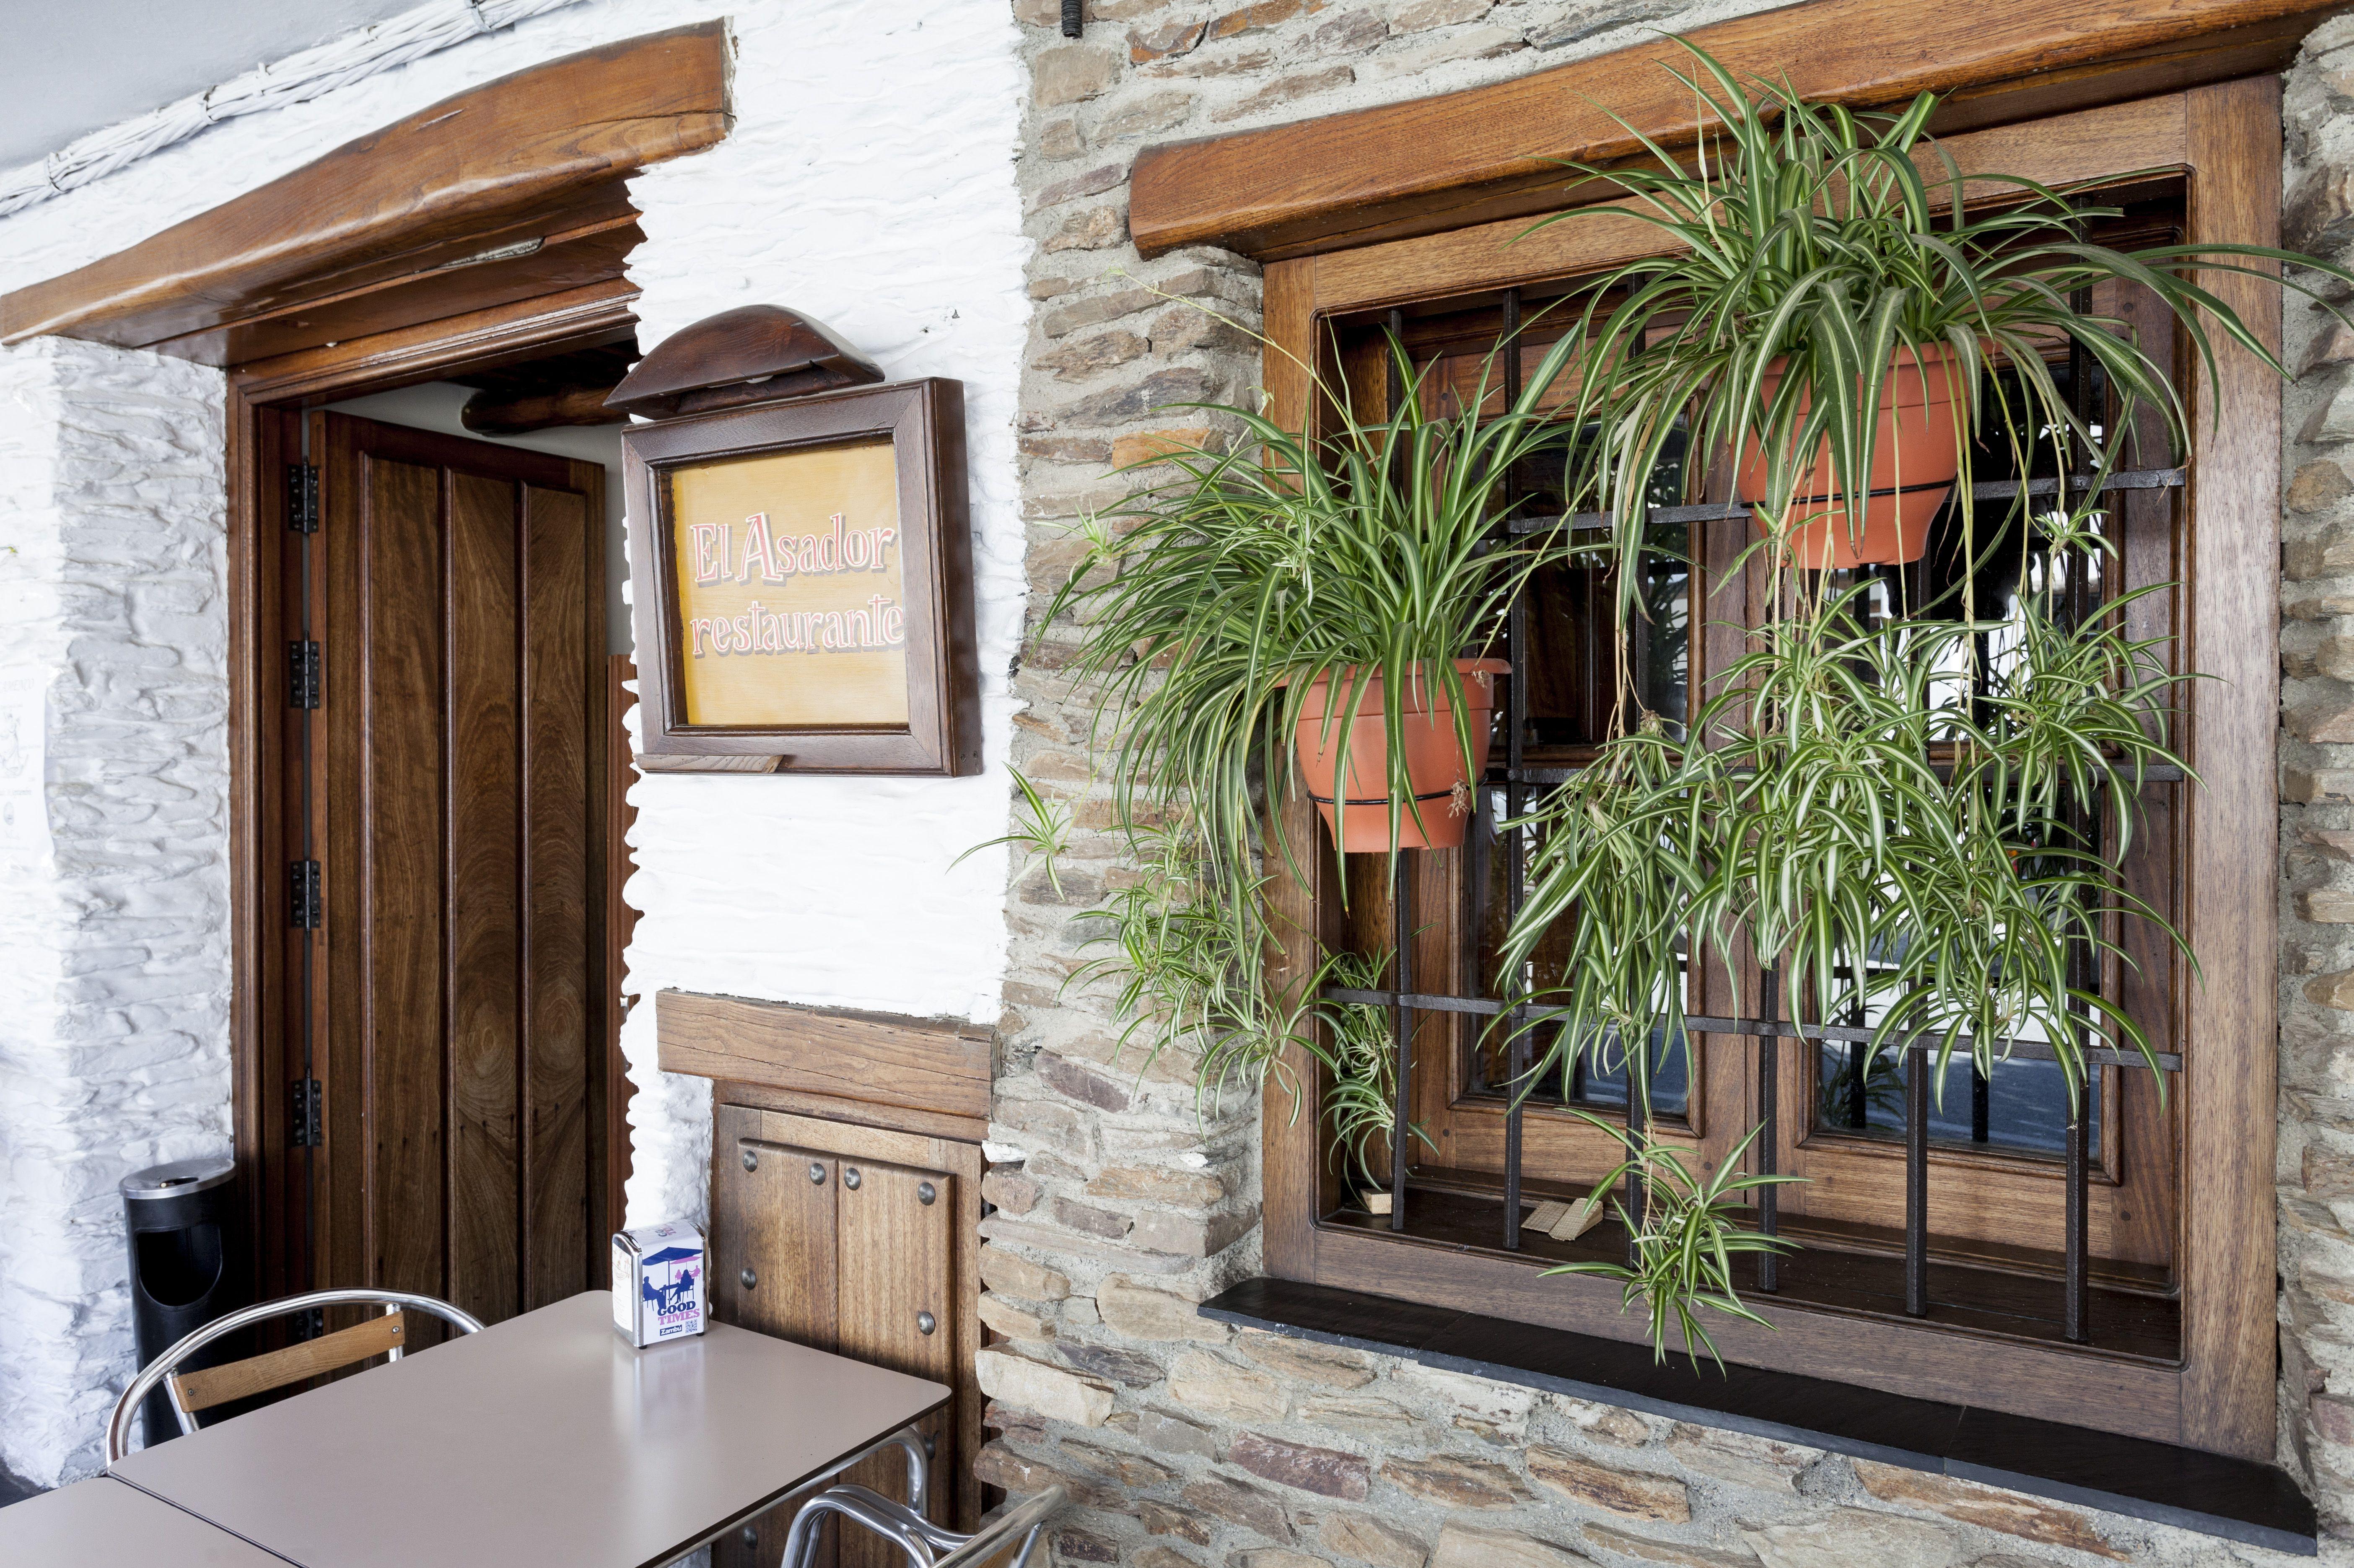 El Asador, restaurante en Capileira, Granada